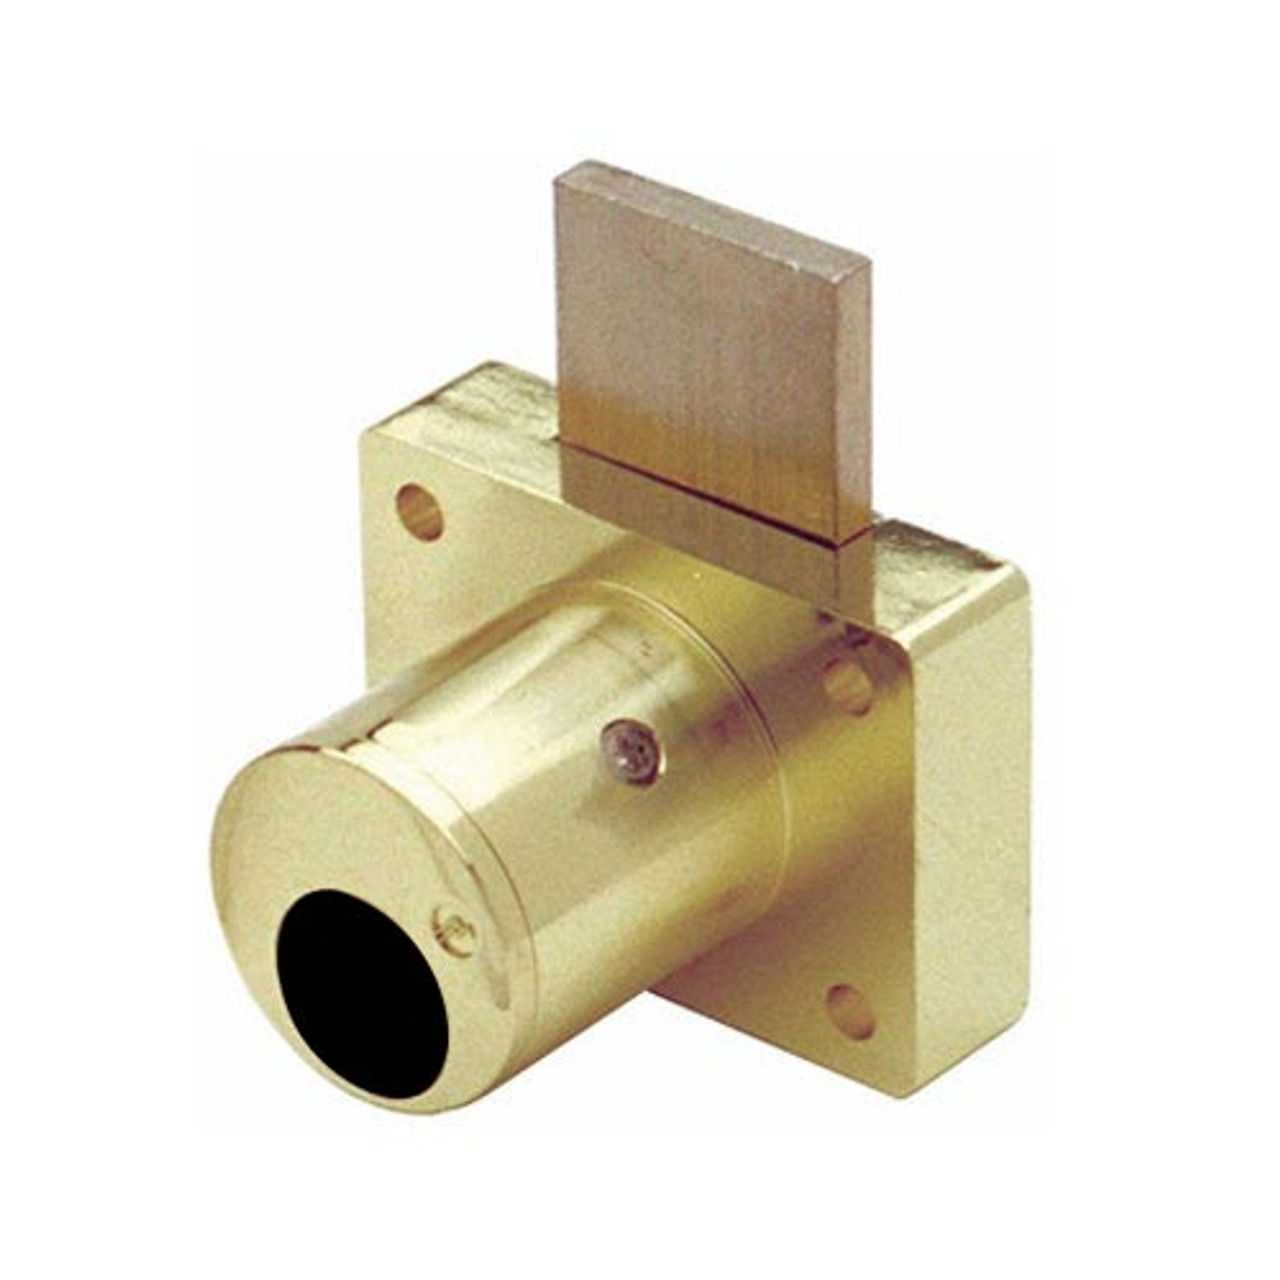 Olympus 800LCA-US3 Cabinet Drawer Deadbolt Less Cylinder Assa Lock in Bright Brass